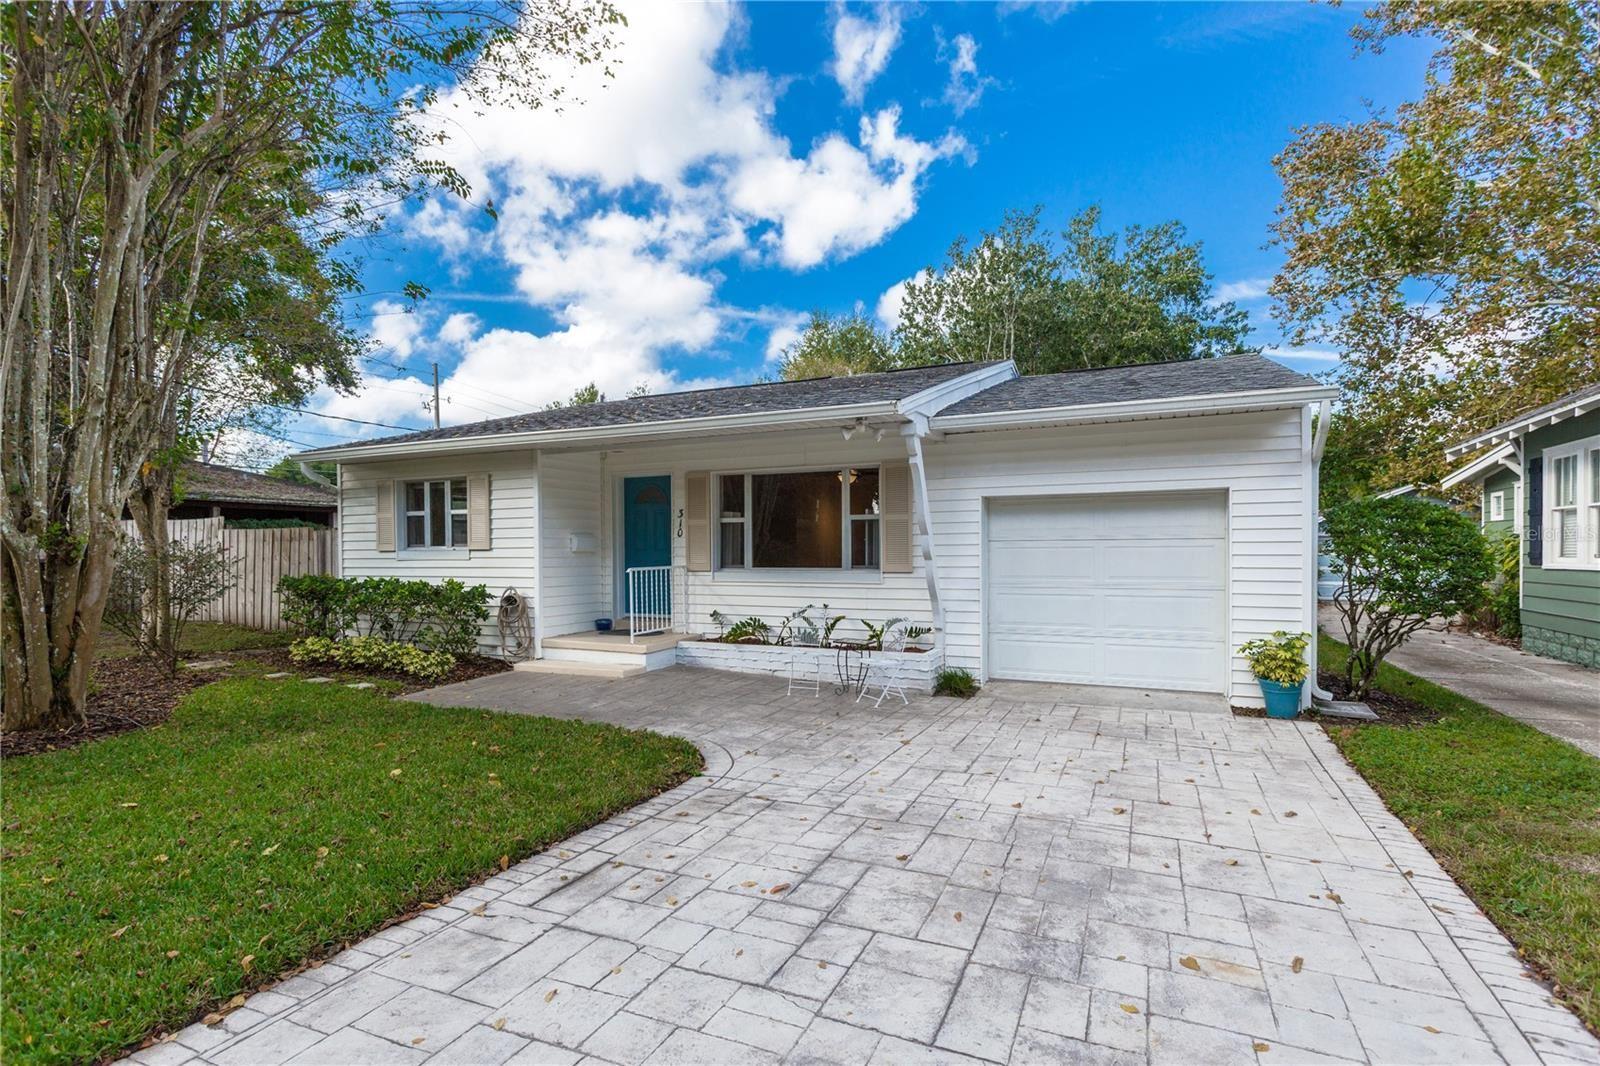 310 THORNTON LANE, Orlando, FL 32801 - #: A4511312